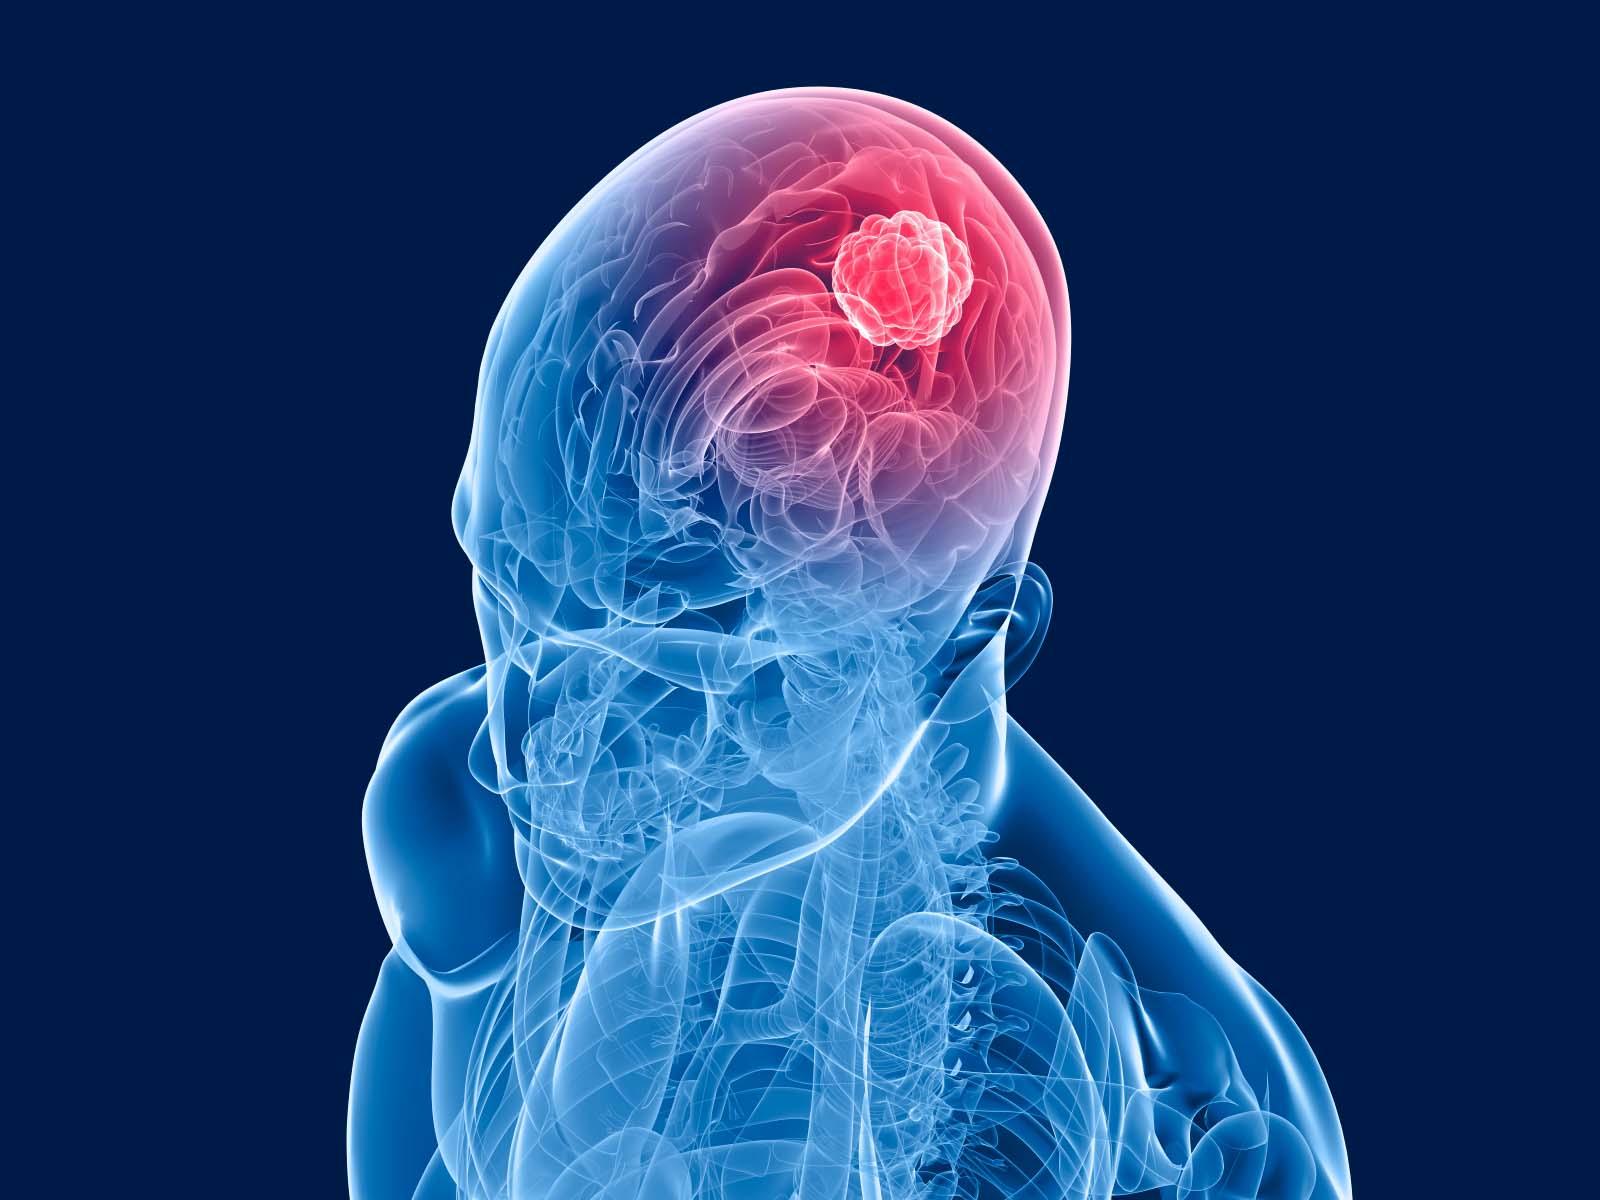 Illustration of brain tumor